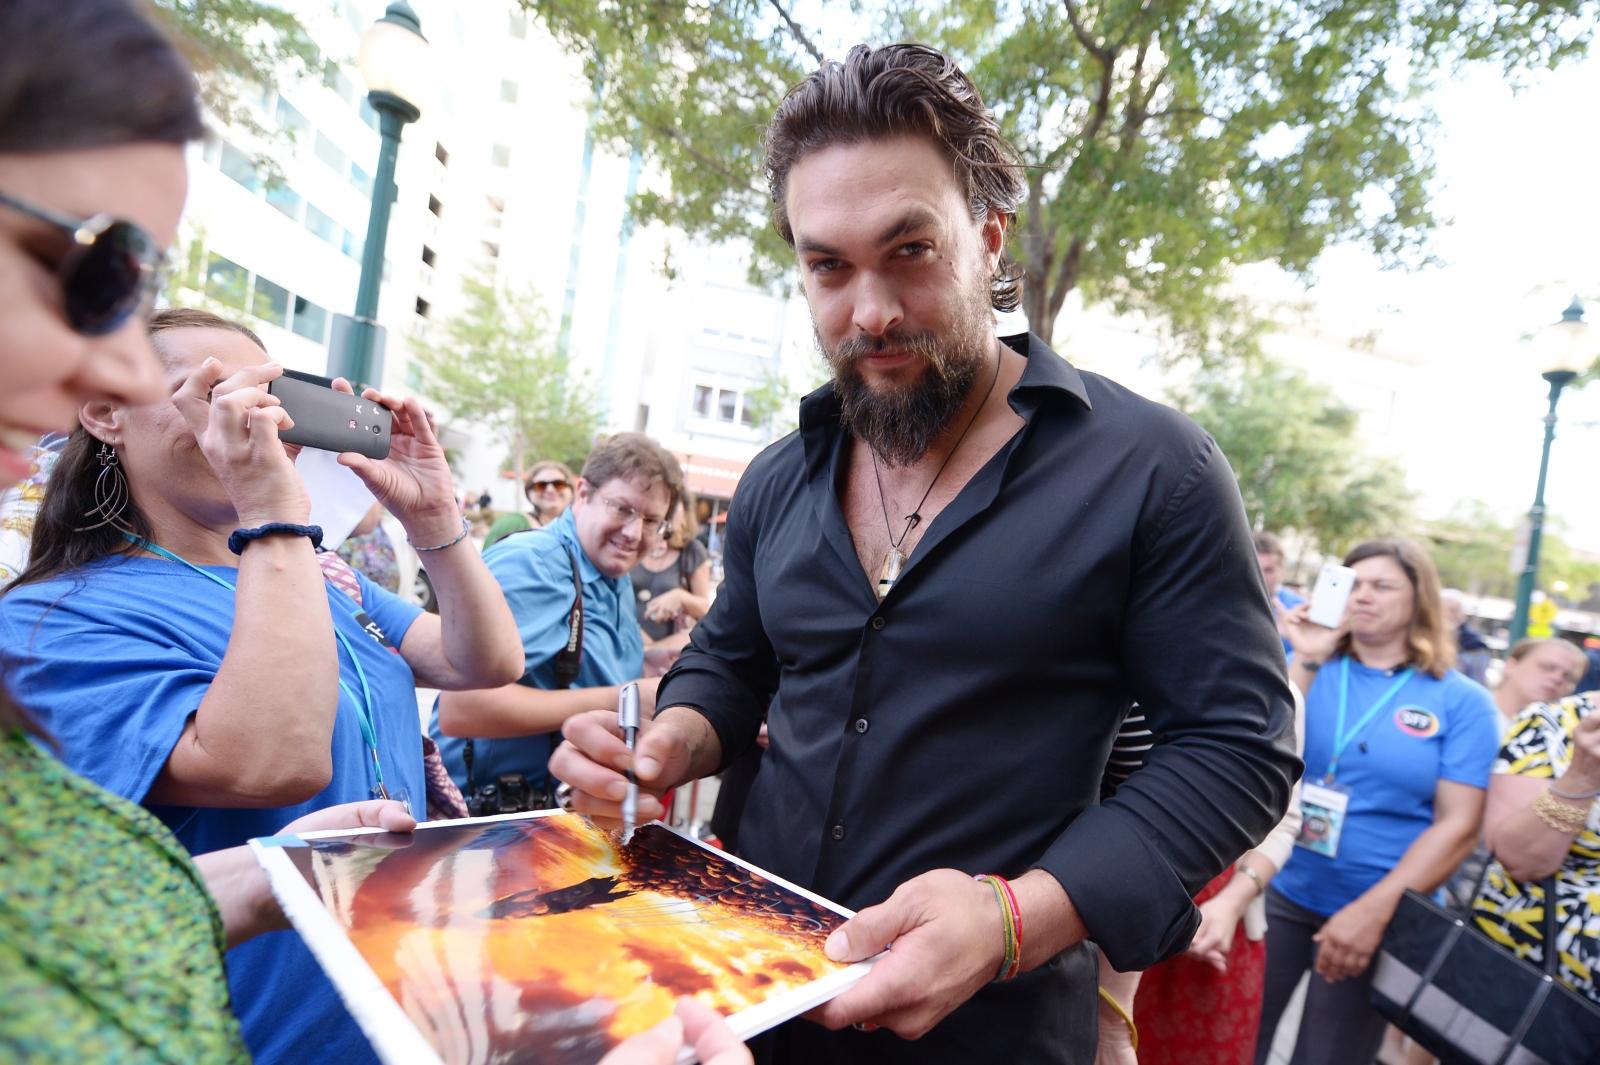 Jason Momoa's Khal Drogo may return